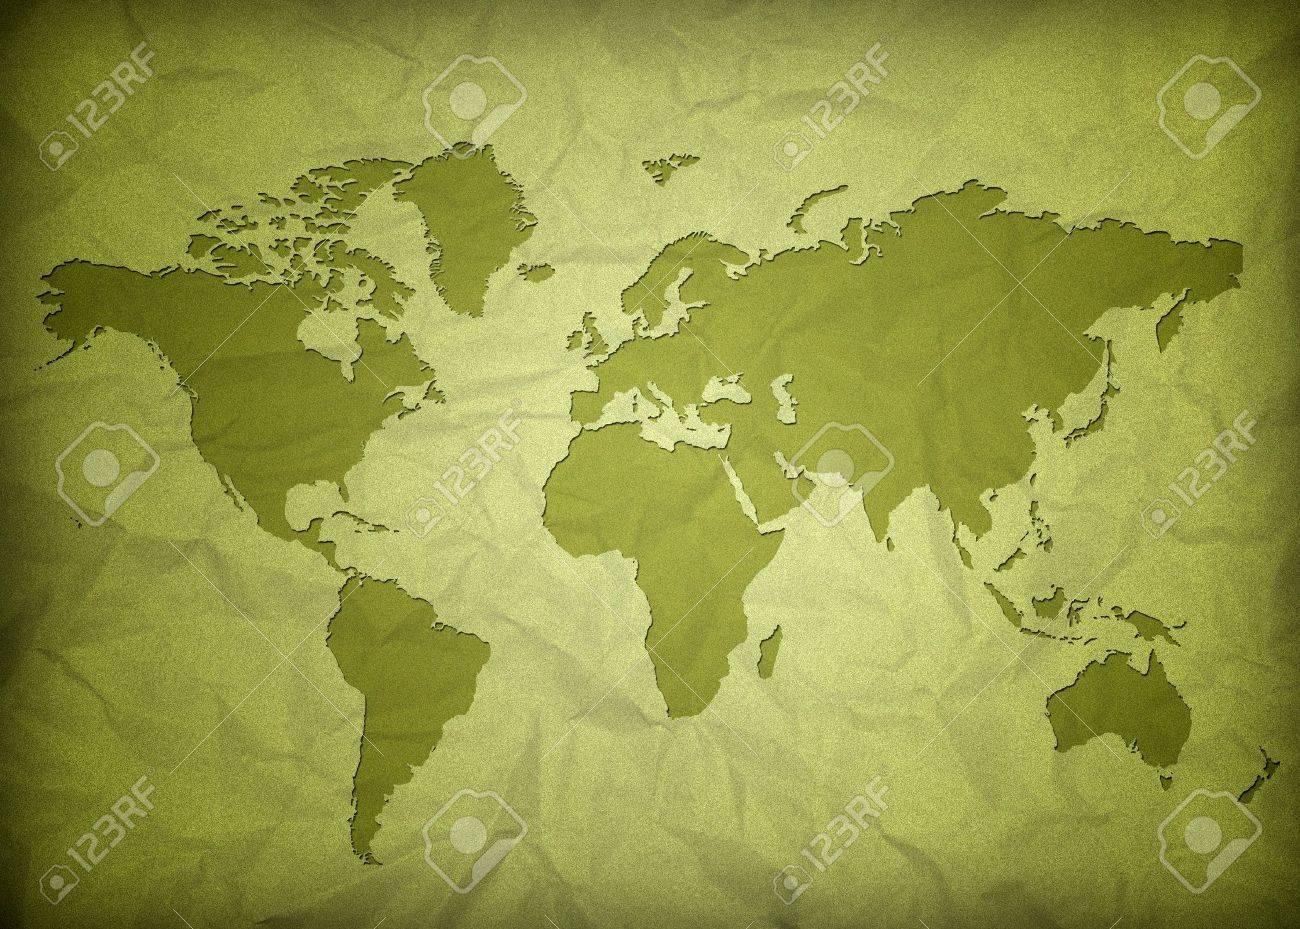 crumpled vintage world map Stock Photo - 9504276